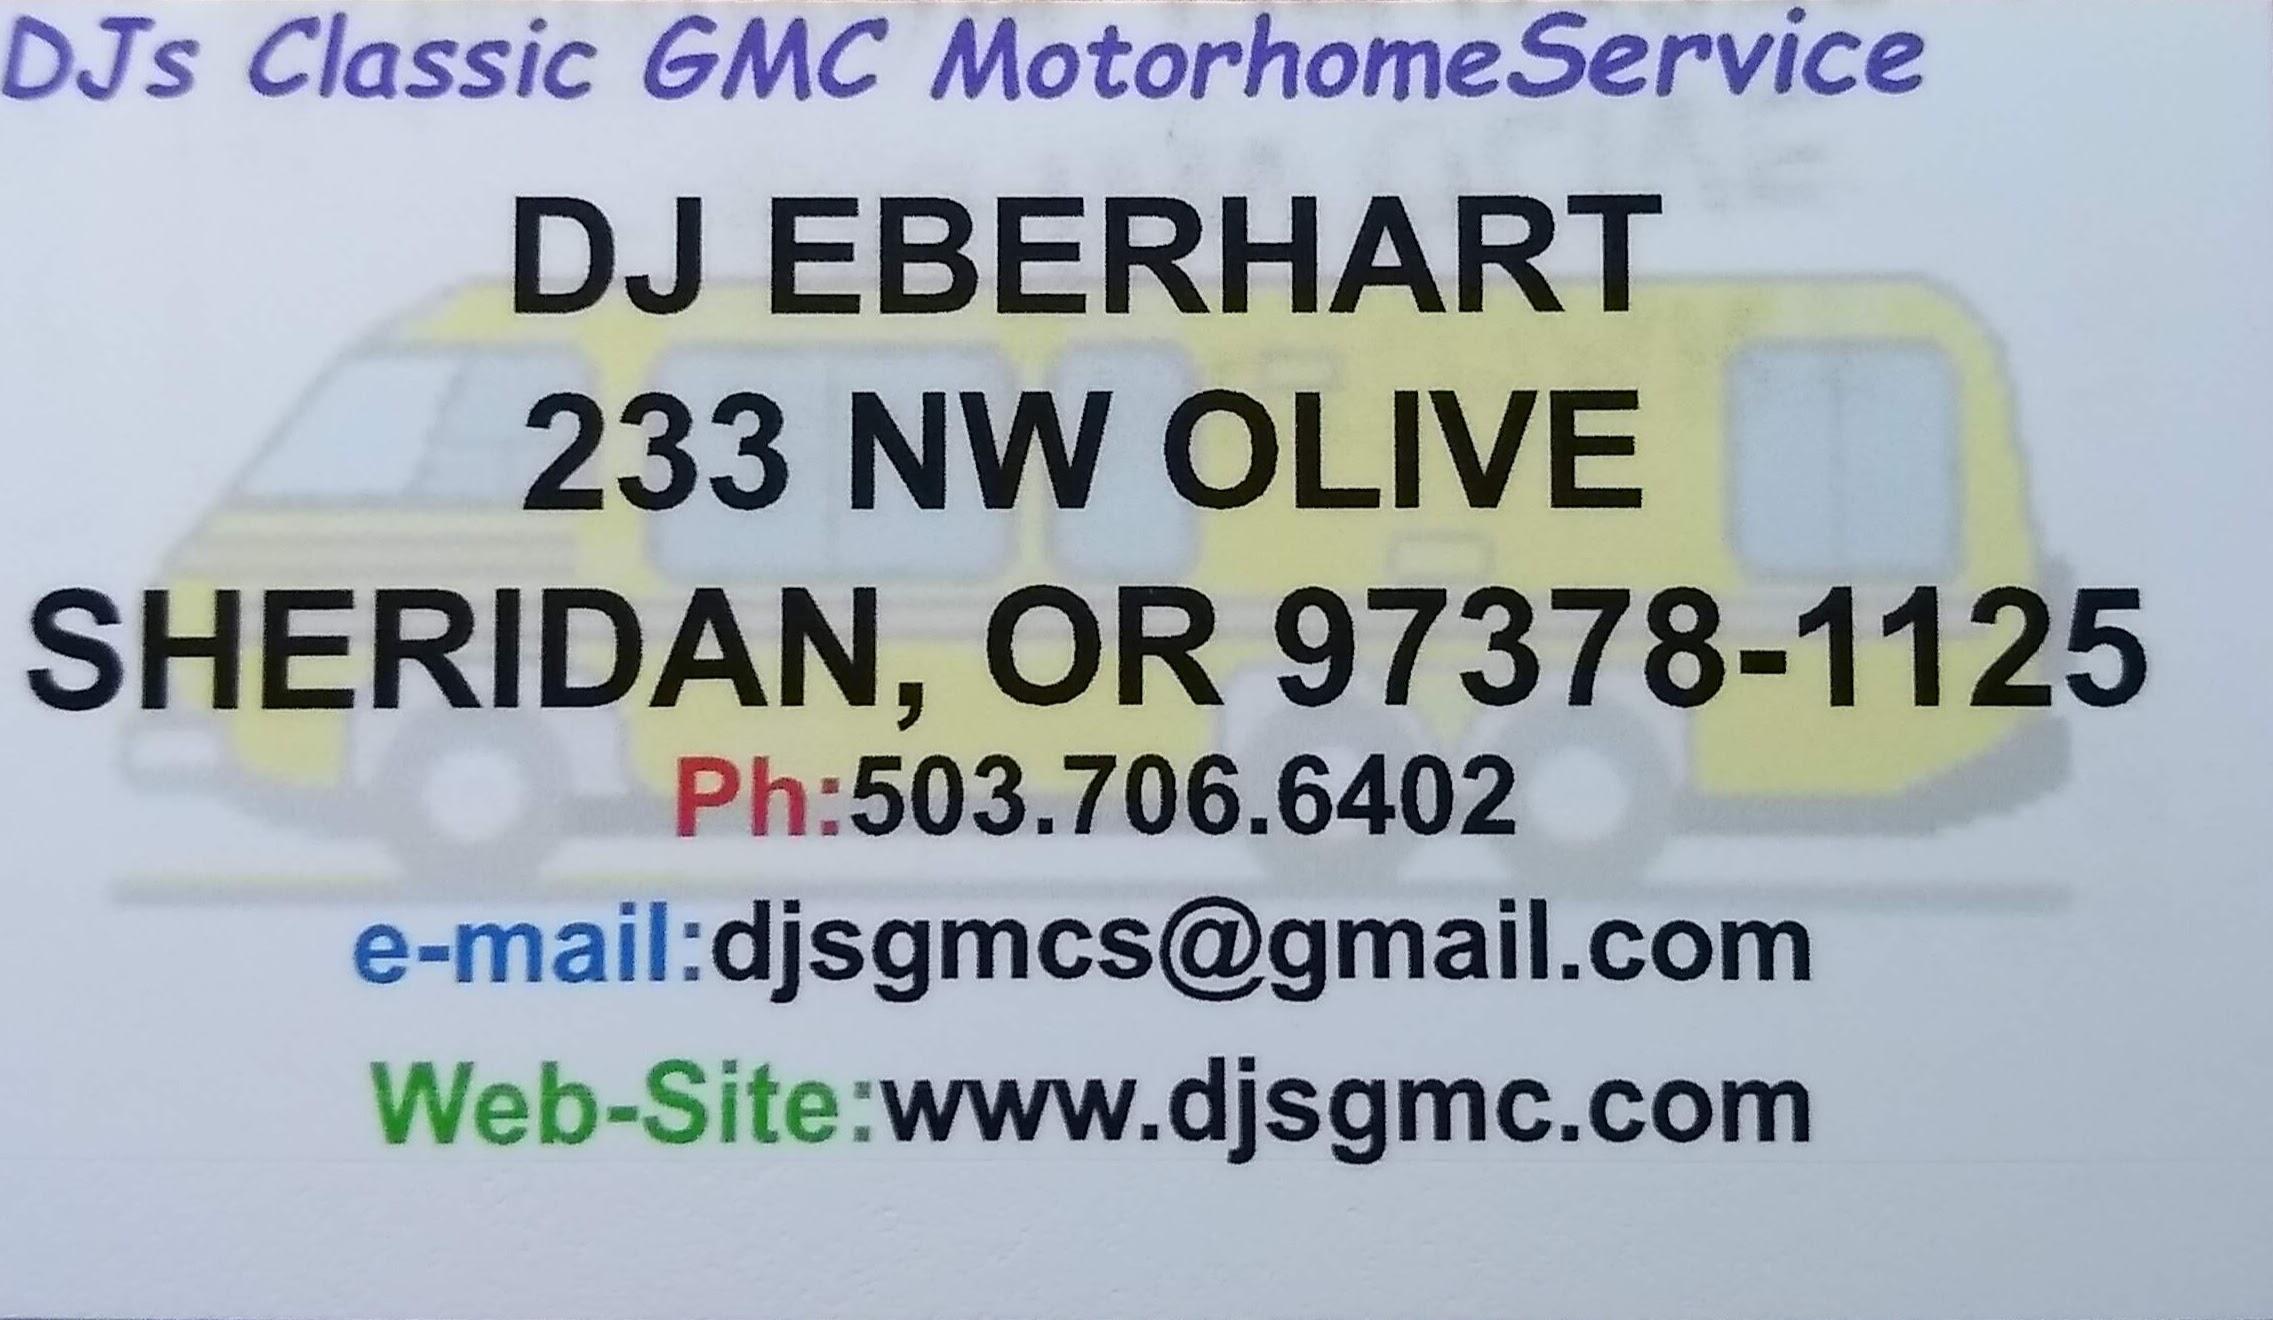 DJs-Classic-GMC-Motorhome-Service